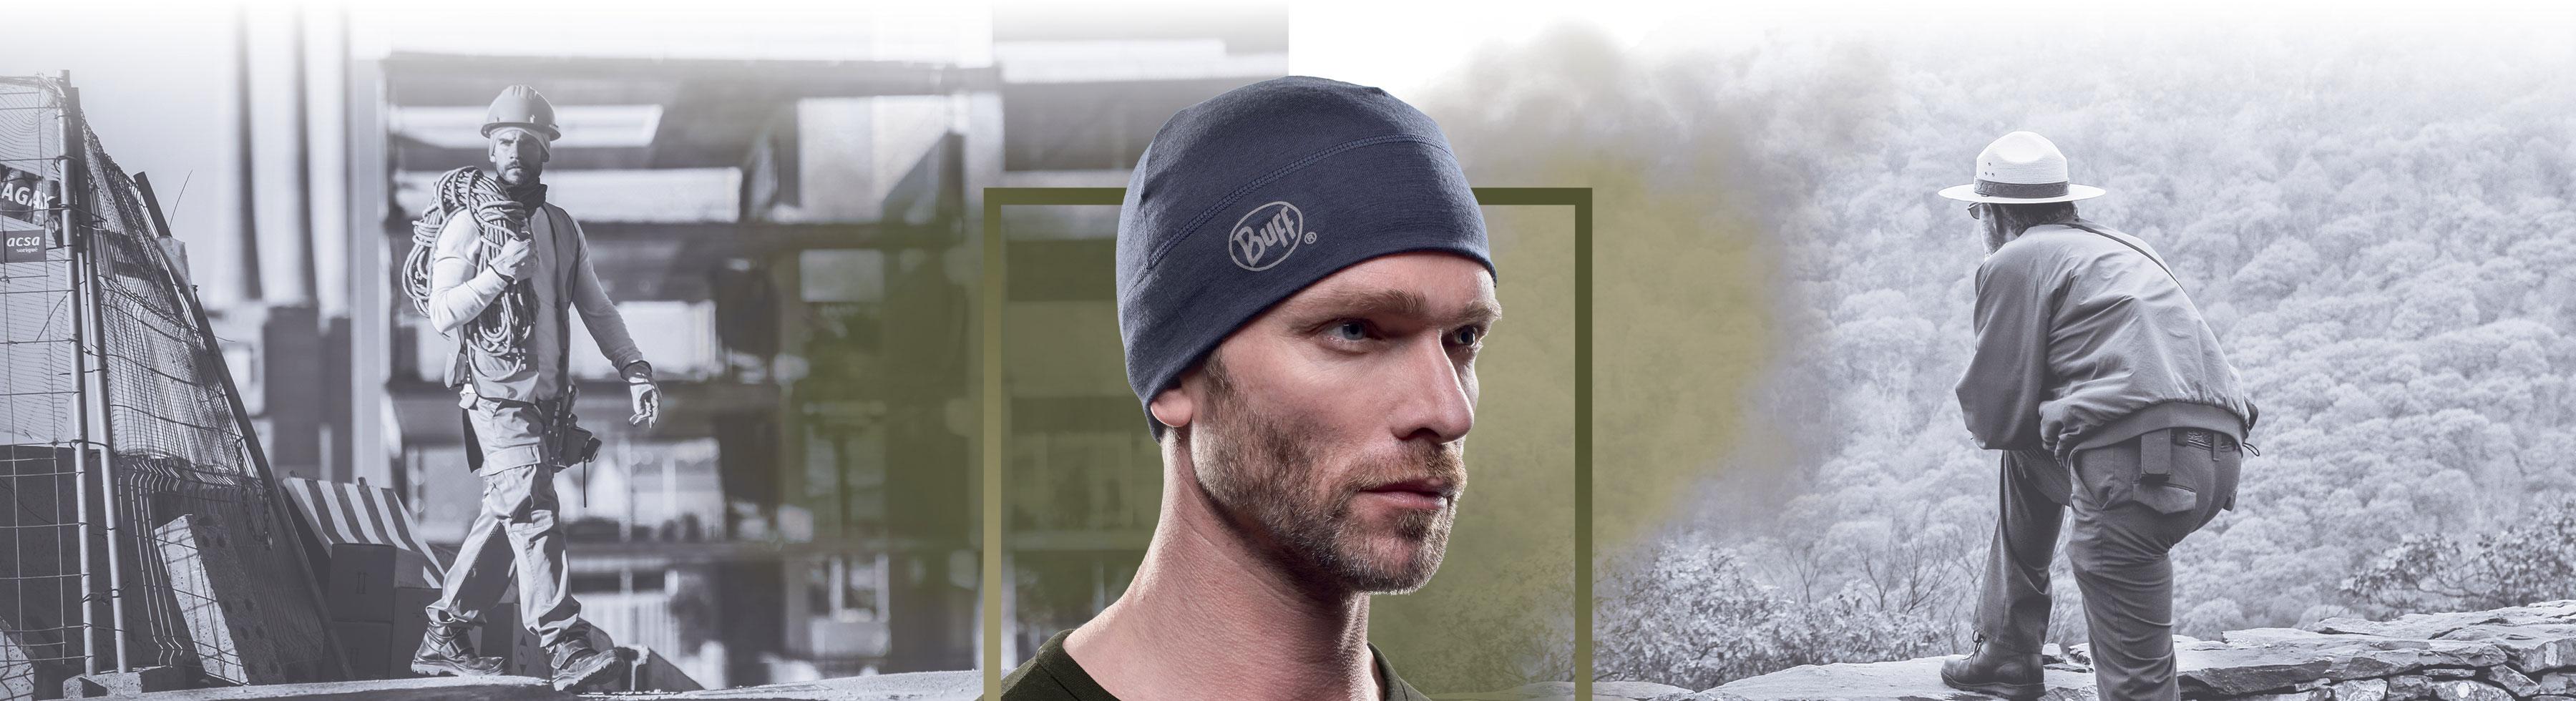 BUFF - Merino Wool 1 Layer Hat - Hovedbeklædning - kasket - hat